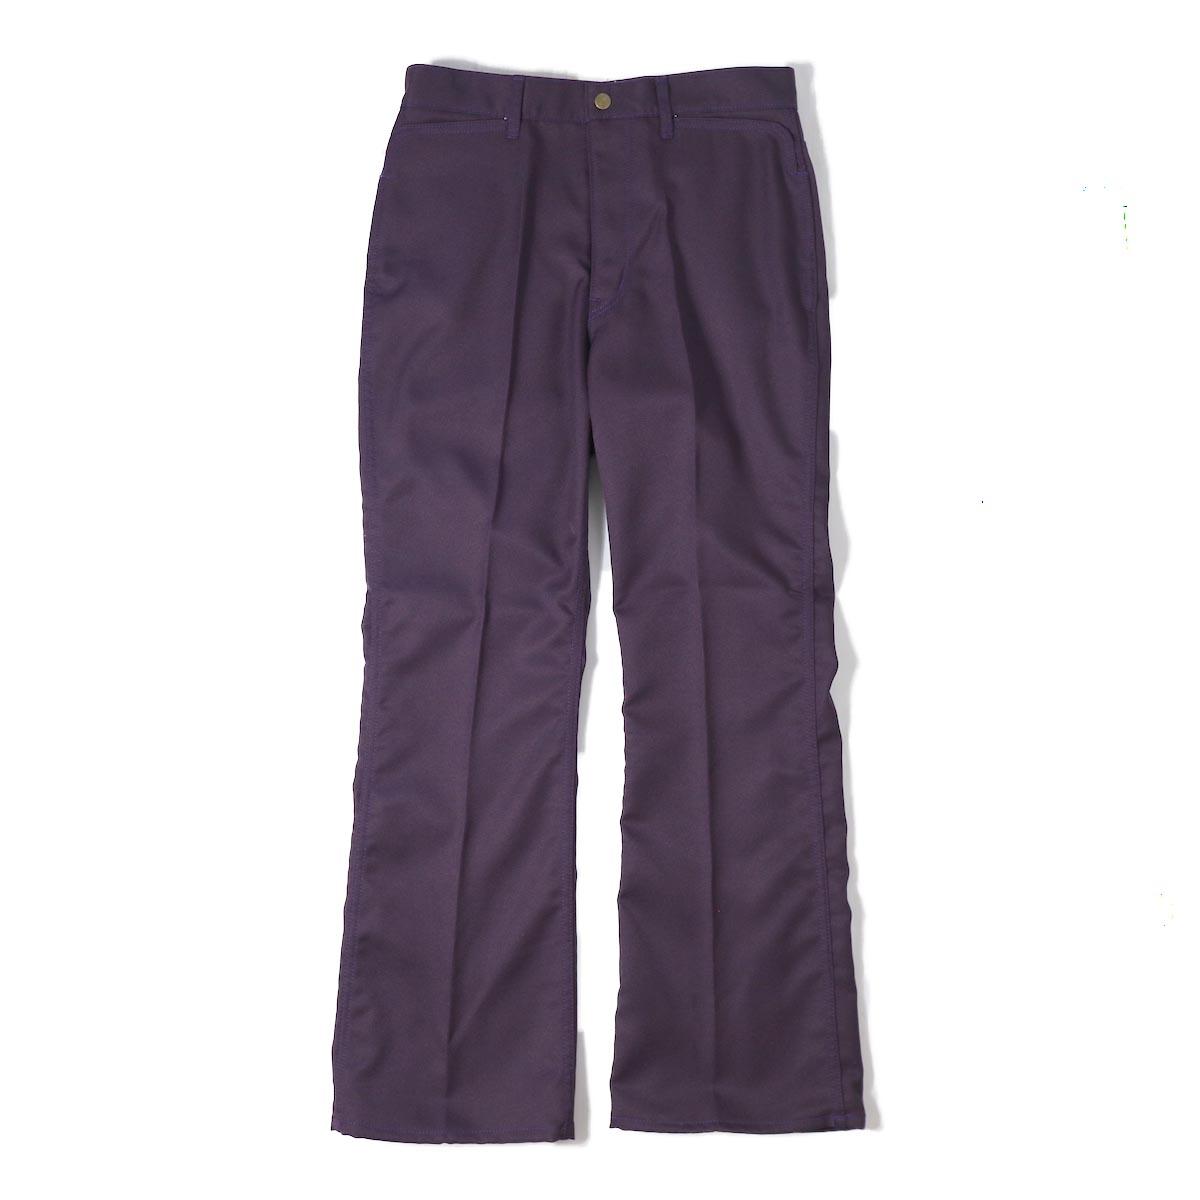 NEEDLES / Boot Cut Jean Poly/C Elastic Twill -Purple